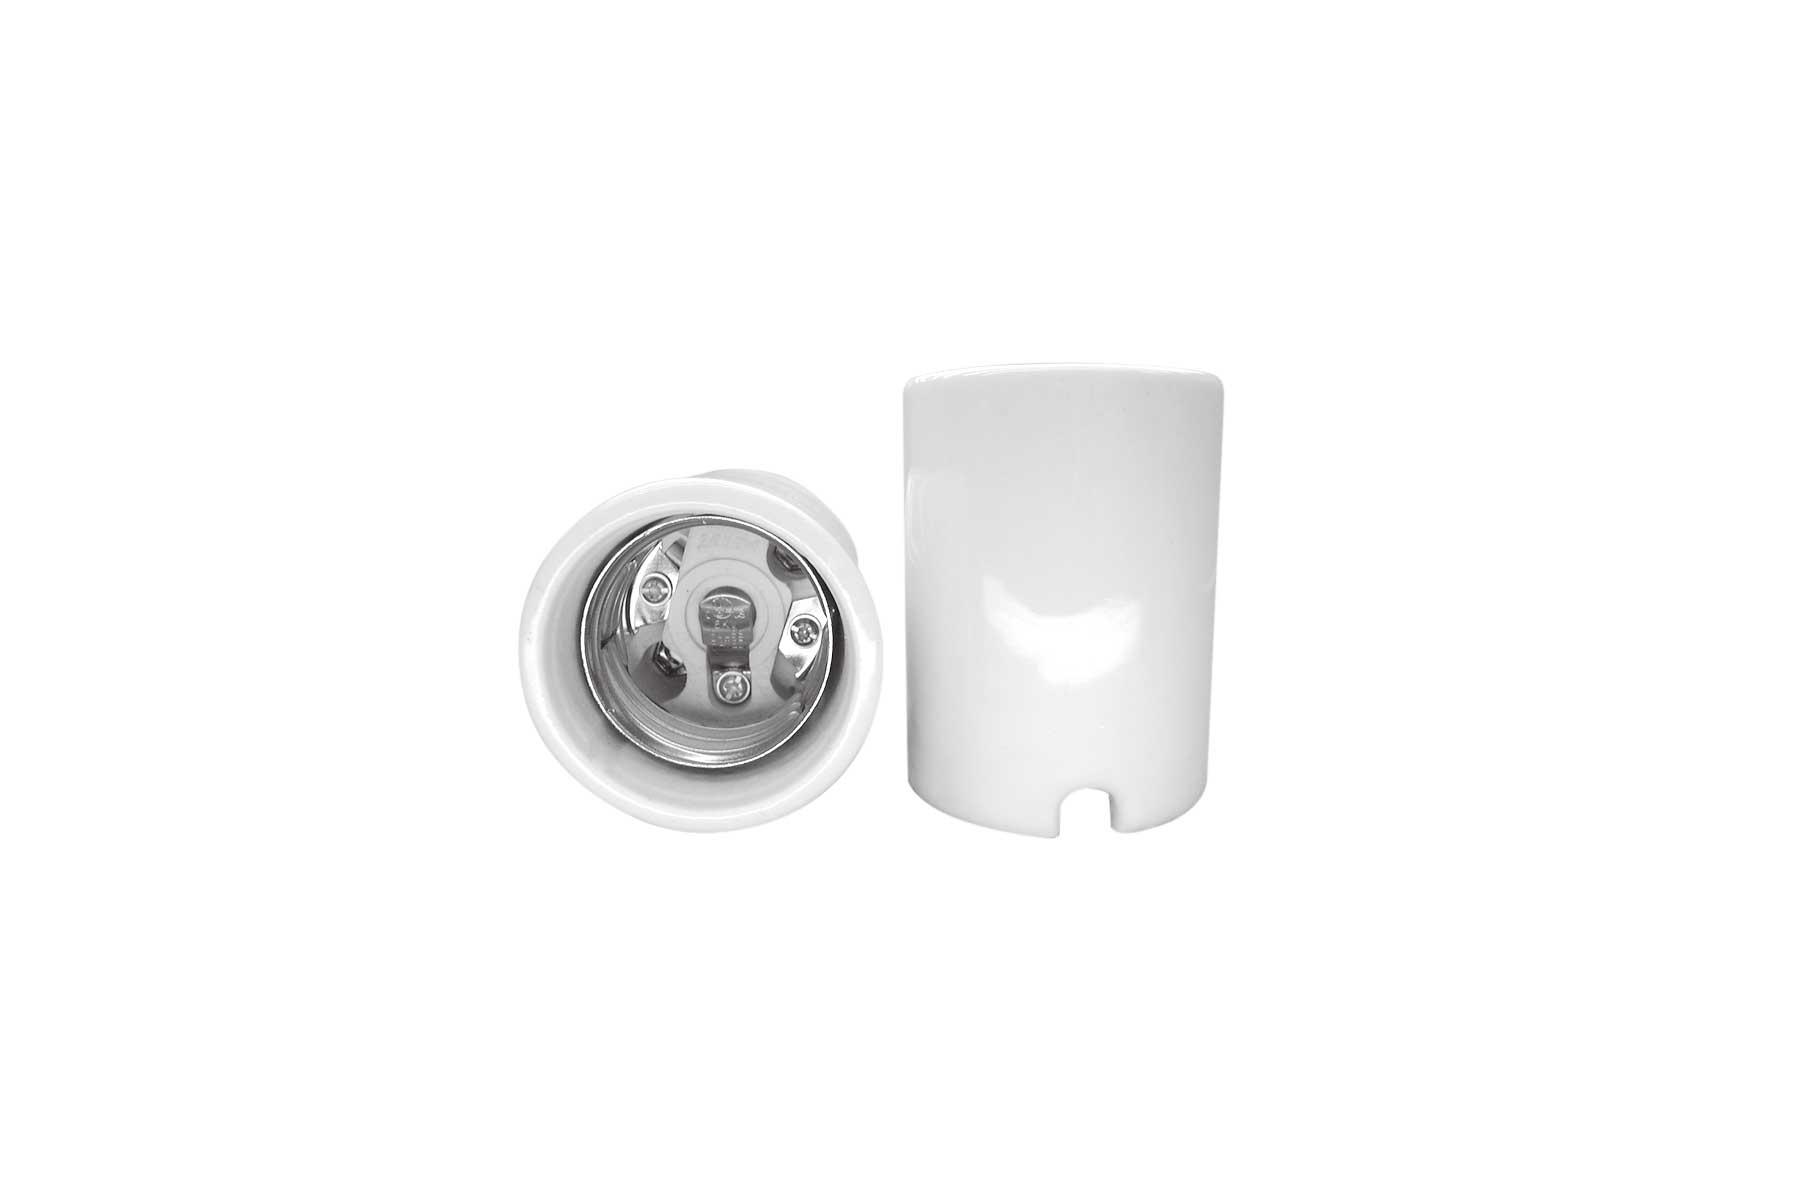 6KV Pulse Rated Mogul Base Porcelain Incandescent Light Socket with Wire Ways